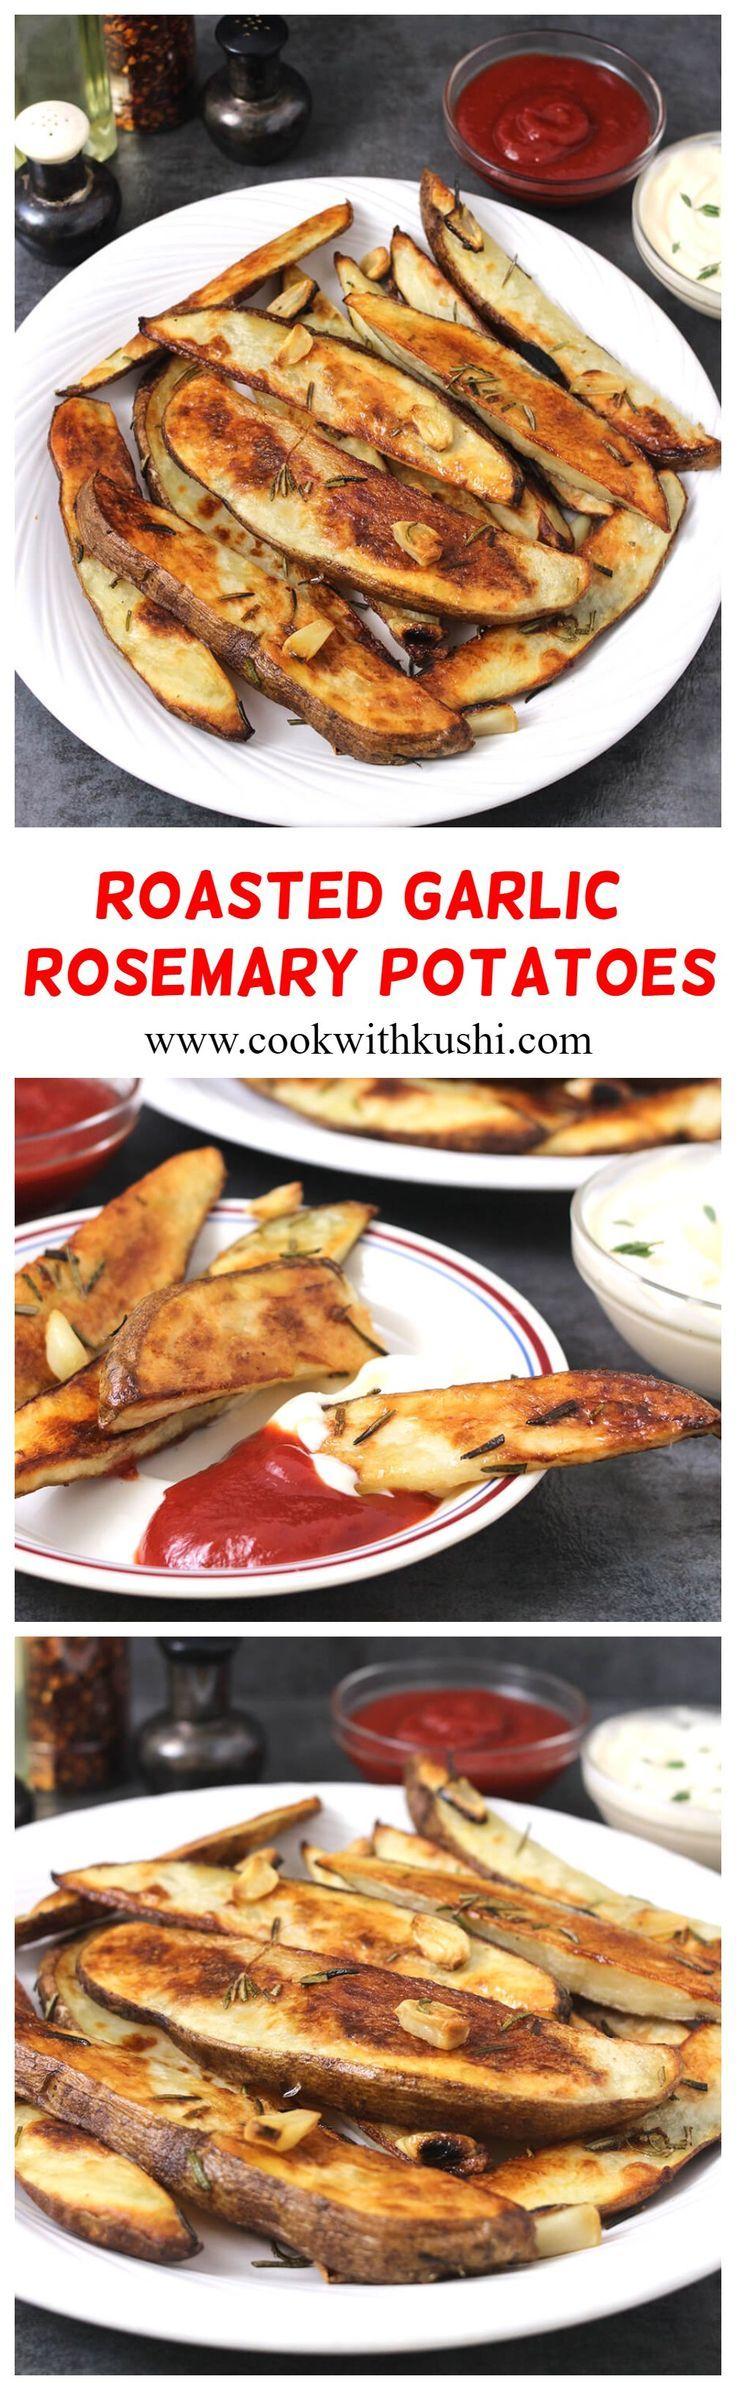 OVEN ROASTED ROSEMARY GARLIC POTATOES - Cook with Kushi